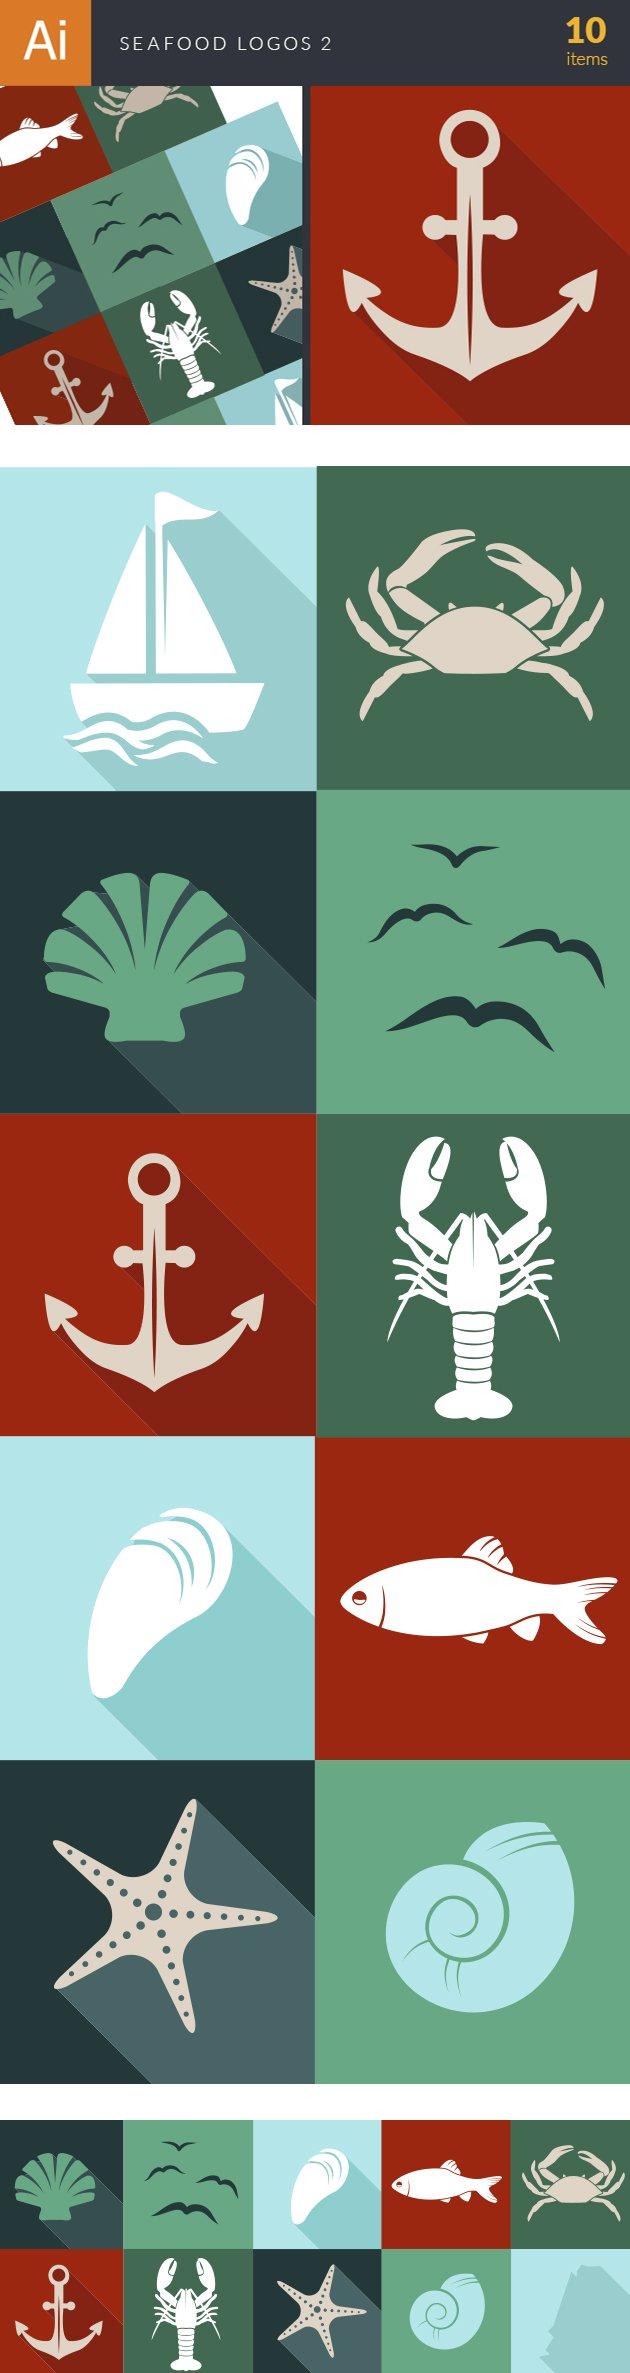 Seafood Logos Vector 2 2